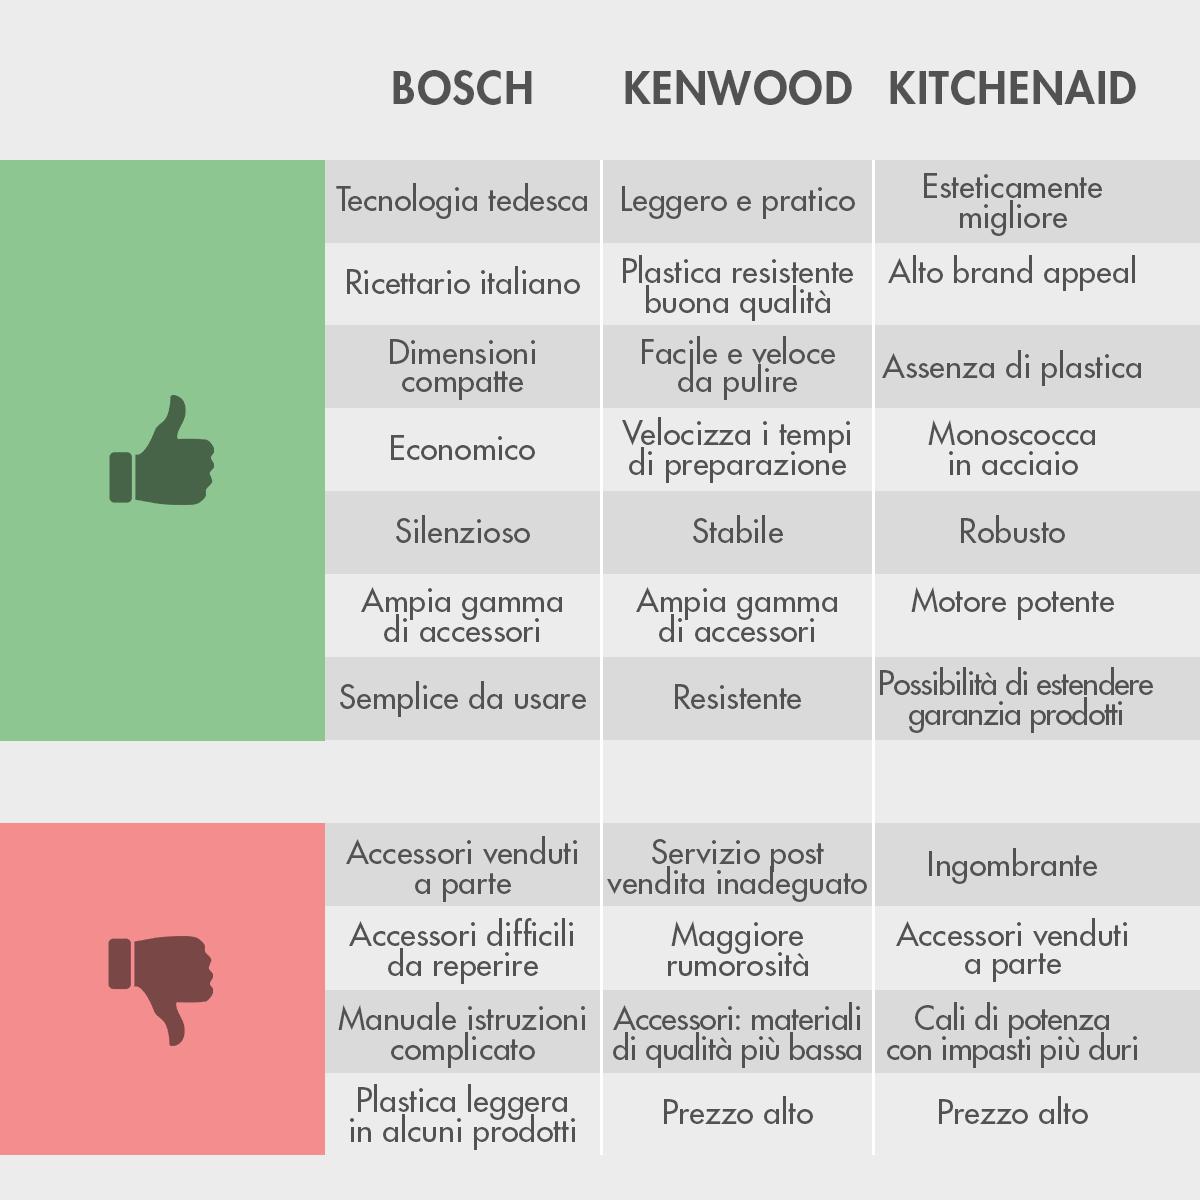 Robot da cucina e recensioni online Bosch Kenwood e